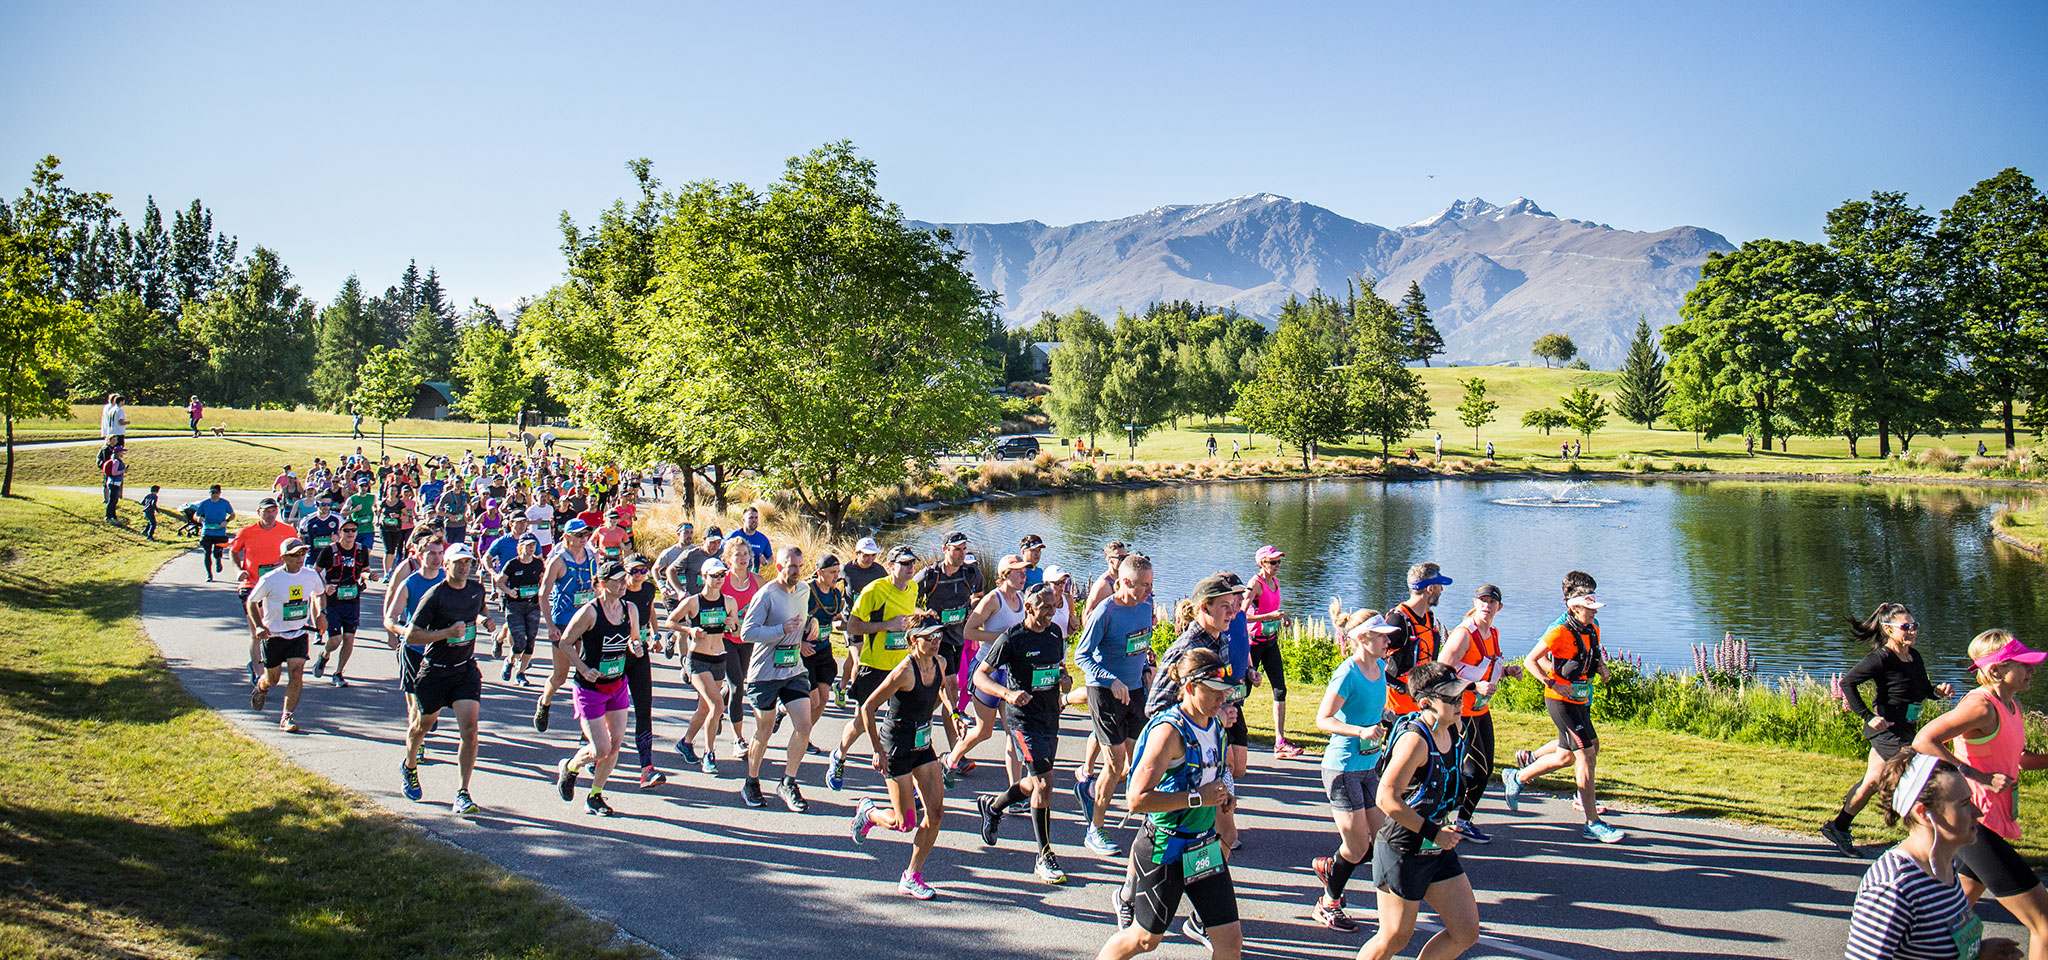 6 Stunning Locations across the World to Run a Marathon